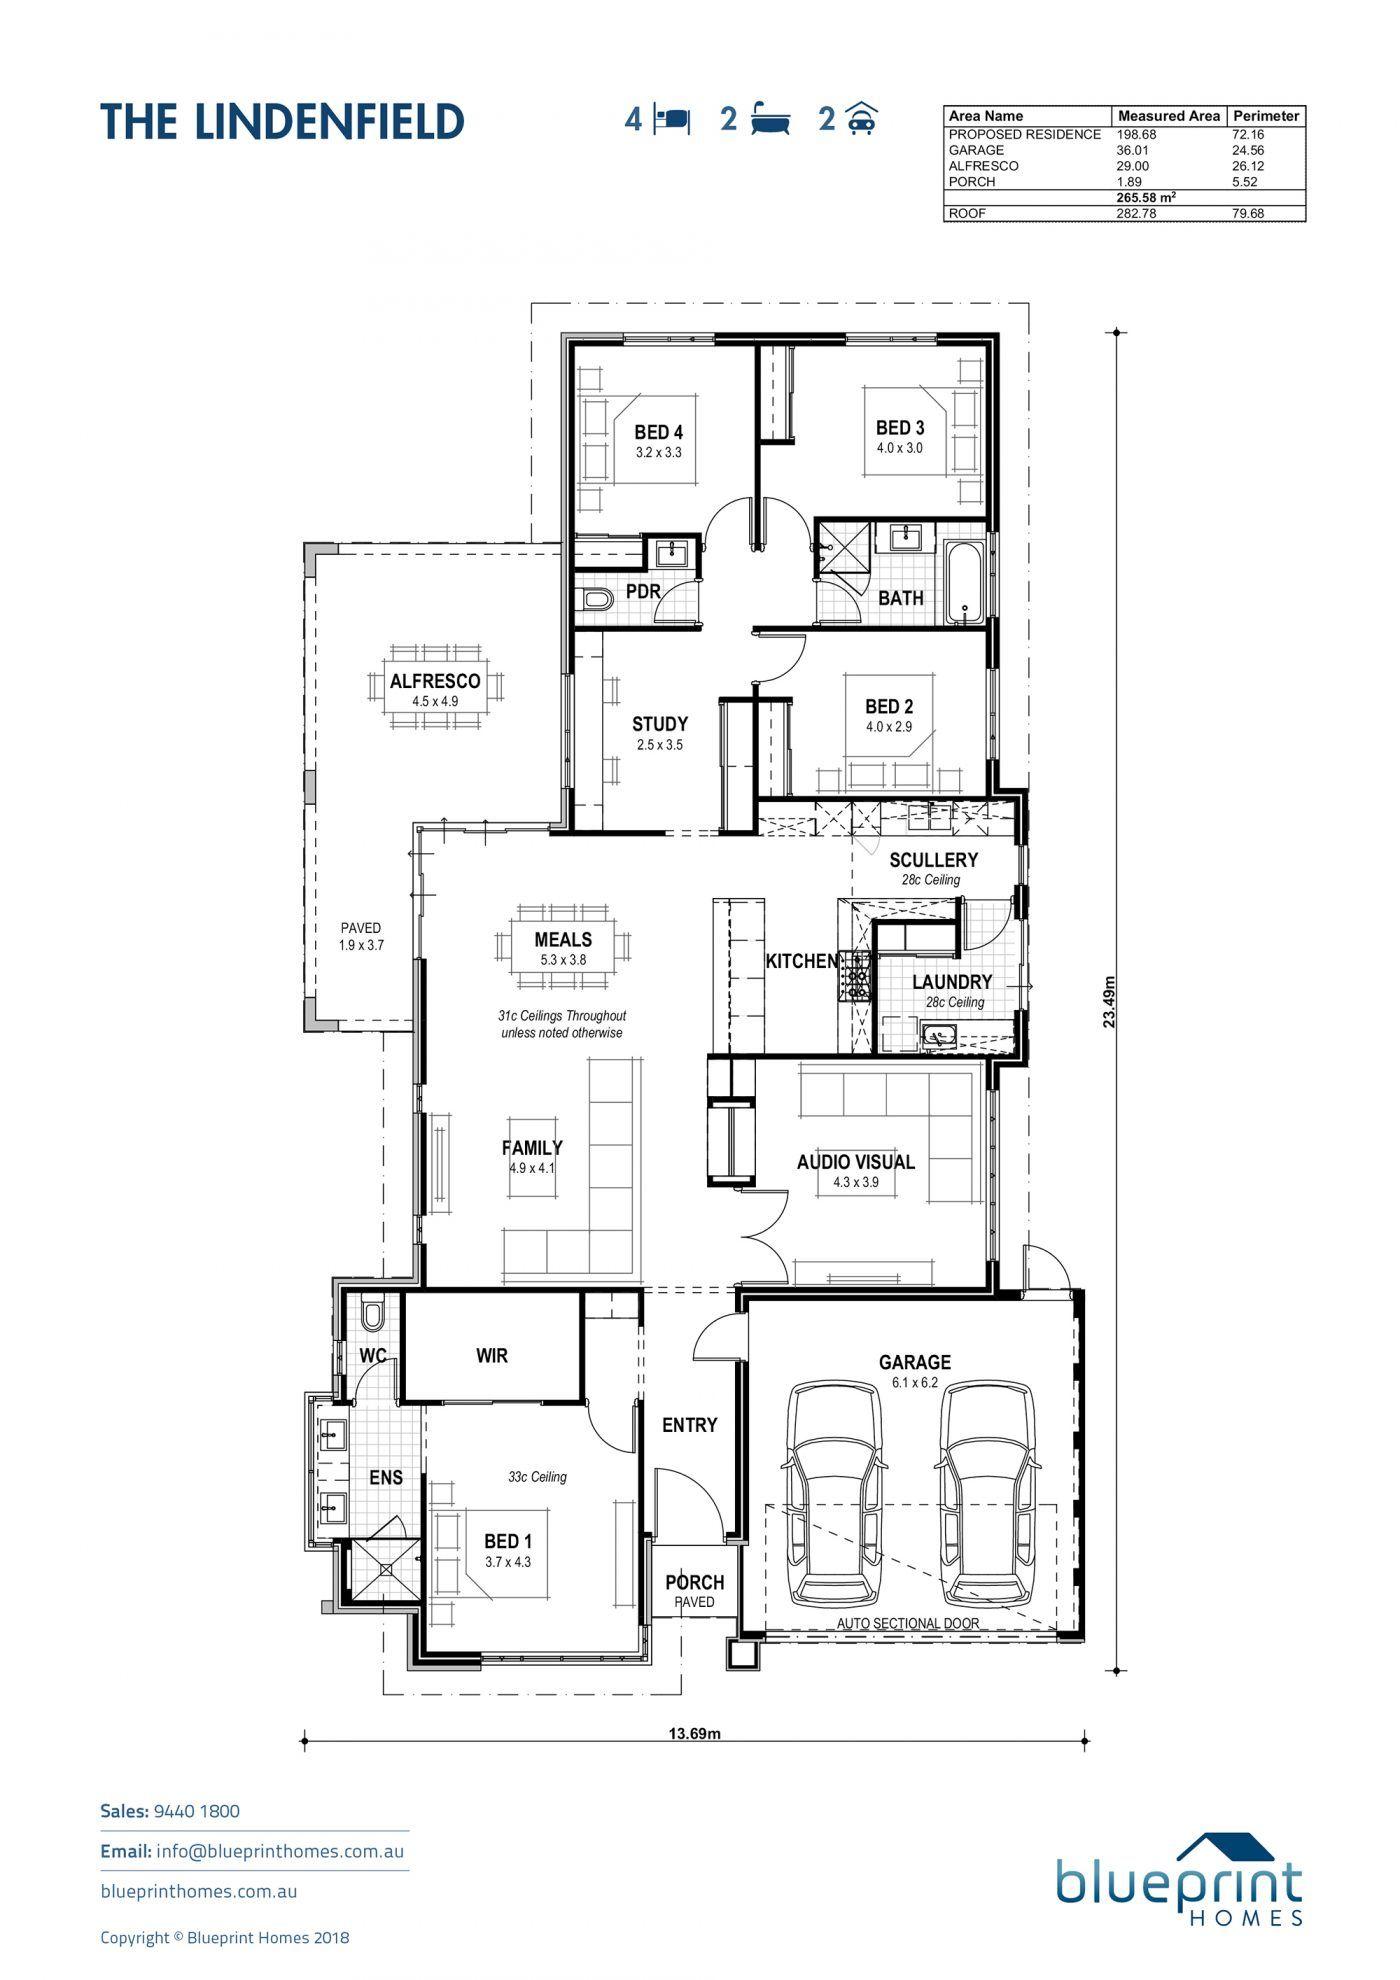 The Lindenfield Perth Display Home Byford Blueprint Homes Display Homes Floor Plan Design Blueprints